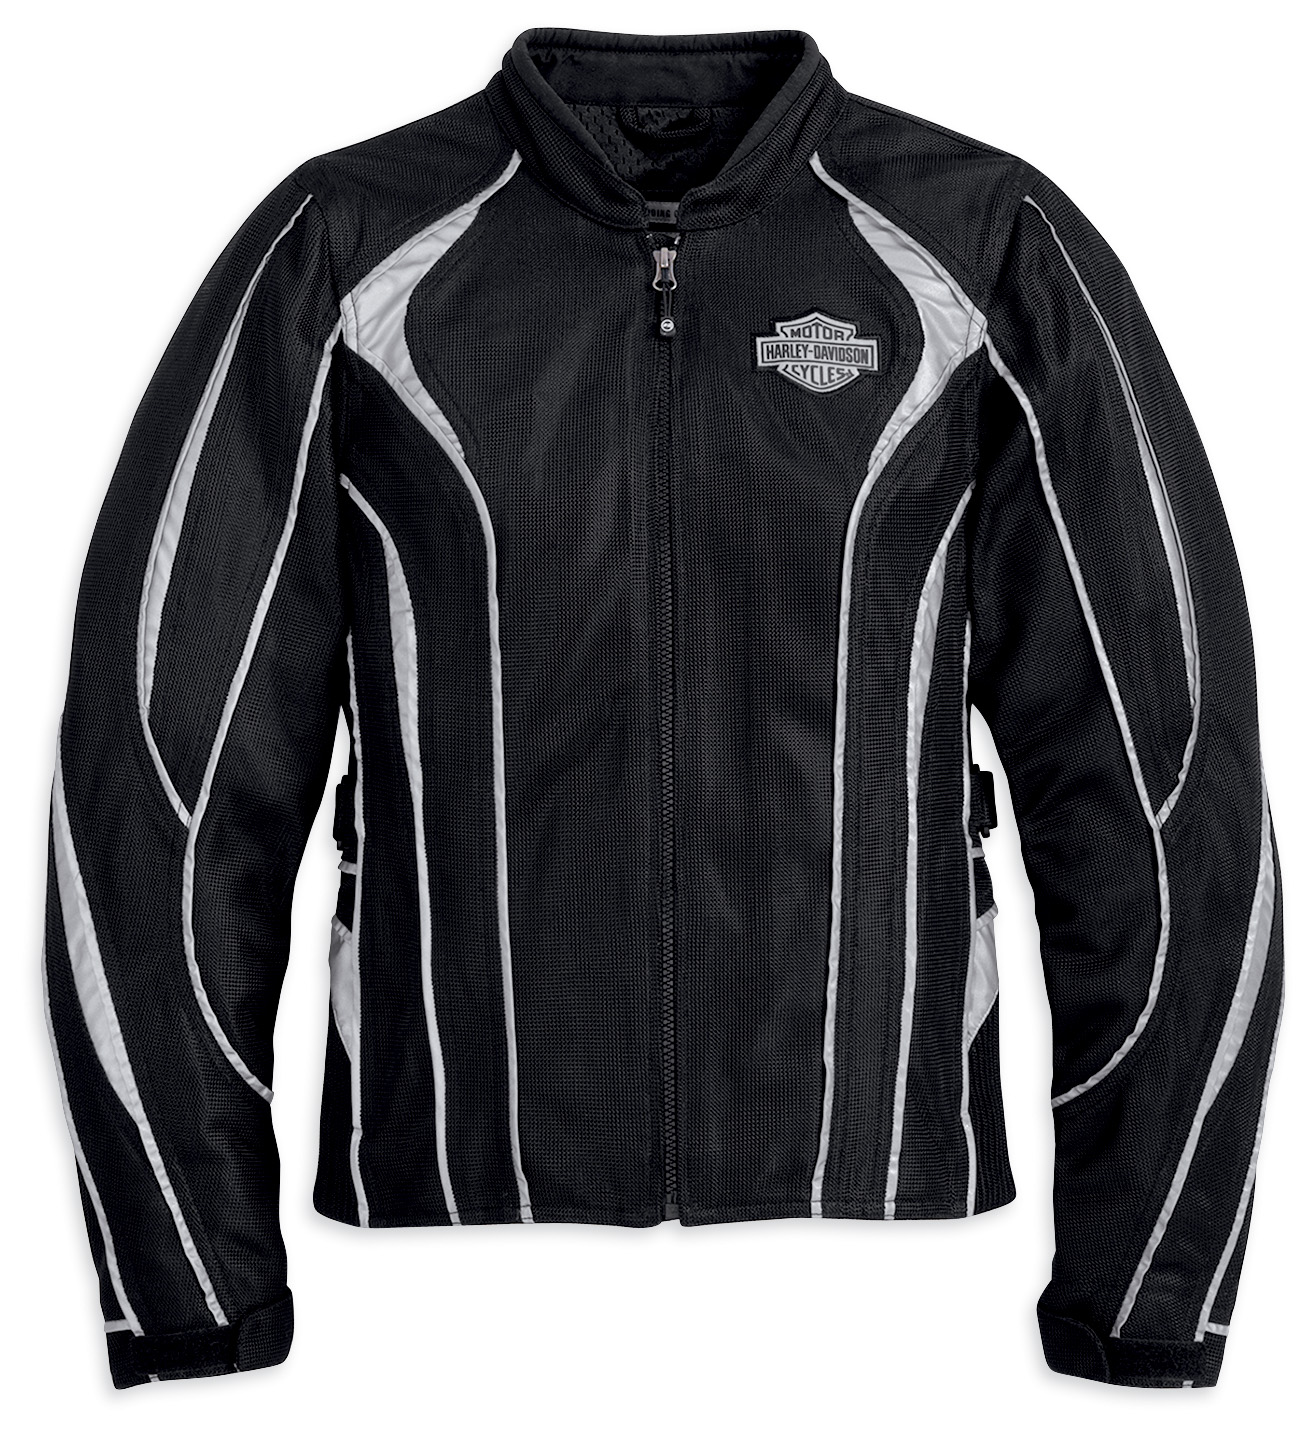 Harley Davidson Krista Jacket